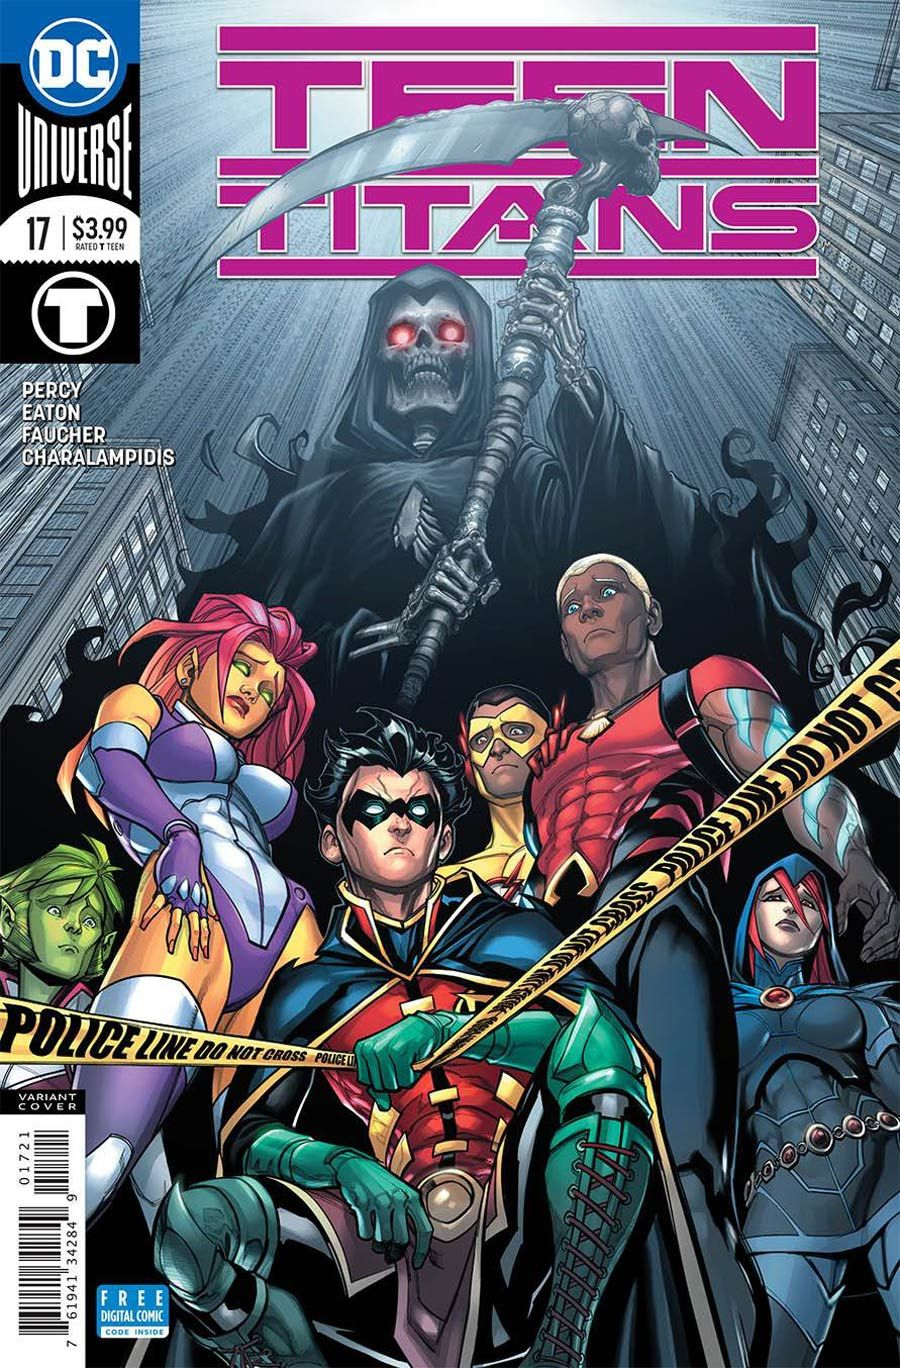 DC COMICS//2017 KHOI PHAM ART /& COVER TEEN TITANS #9 REBIRTH